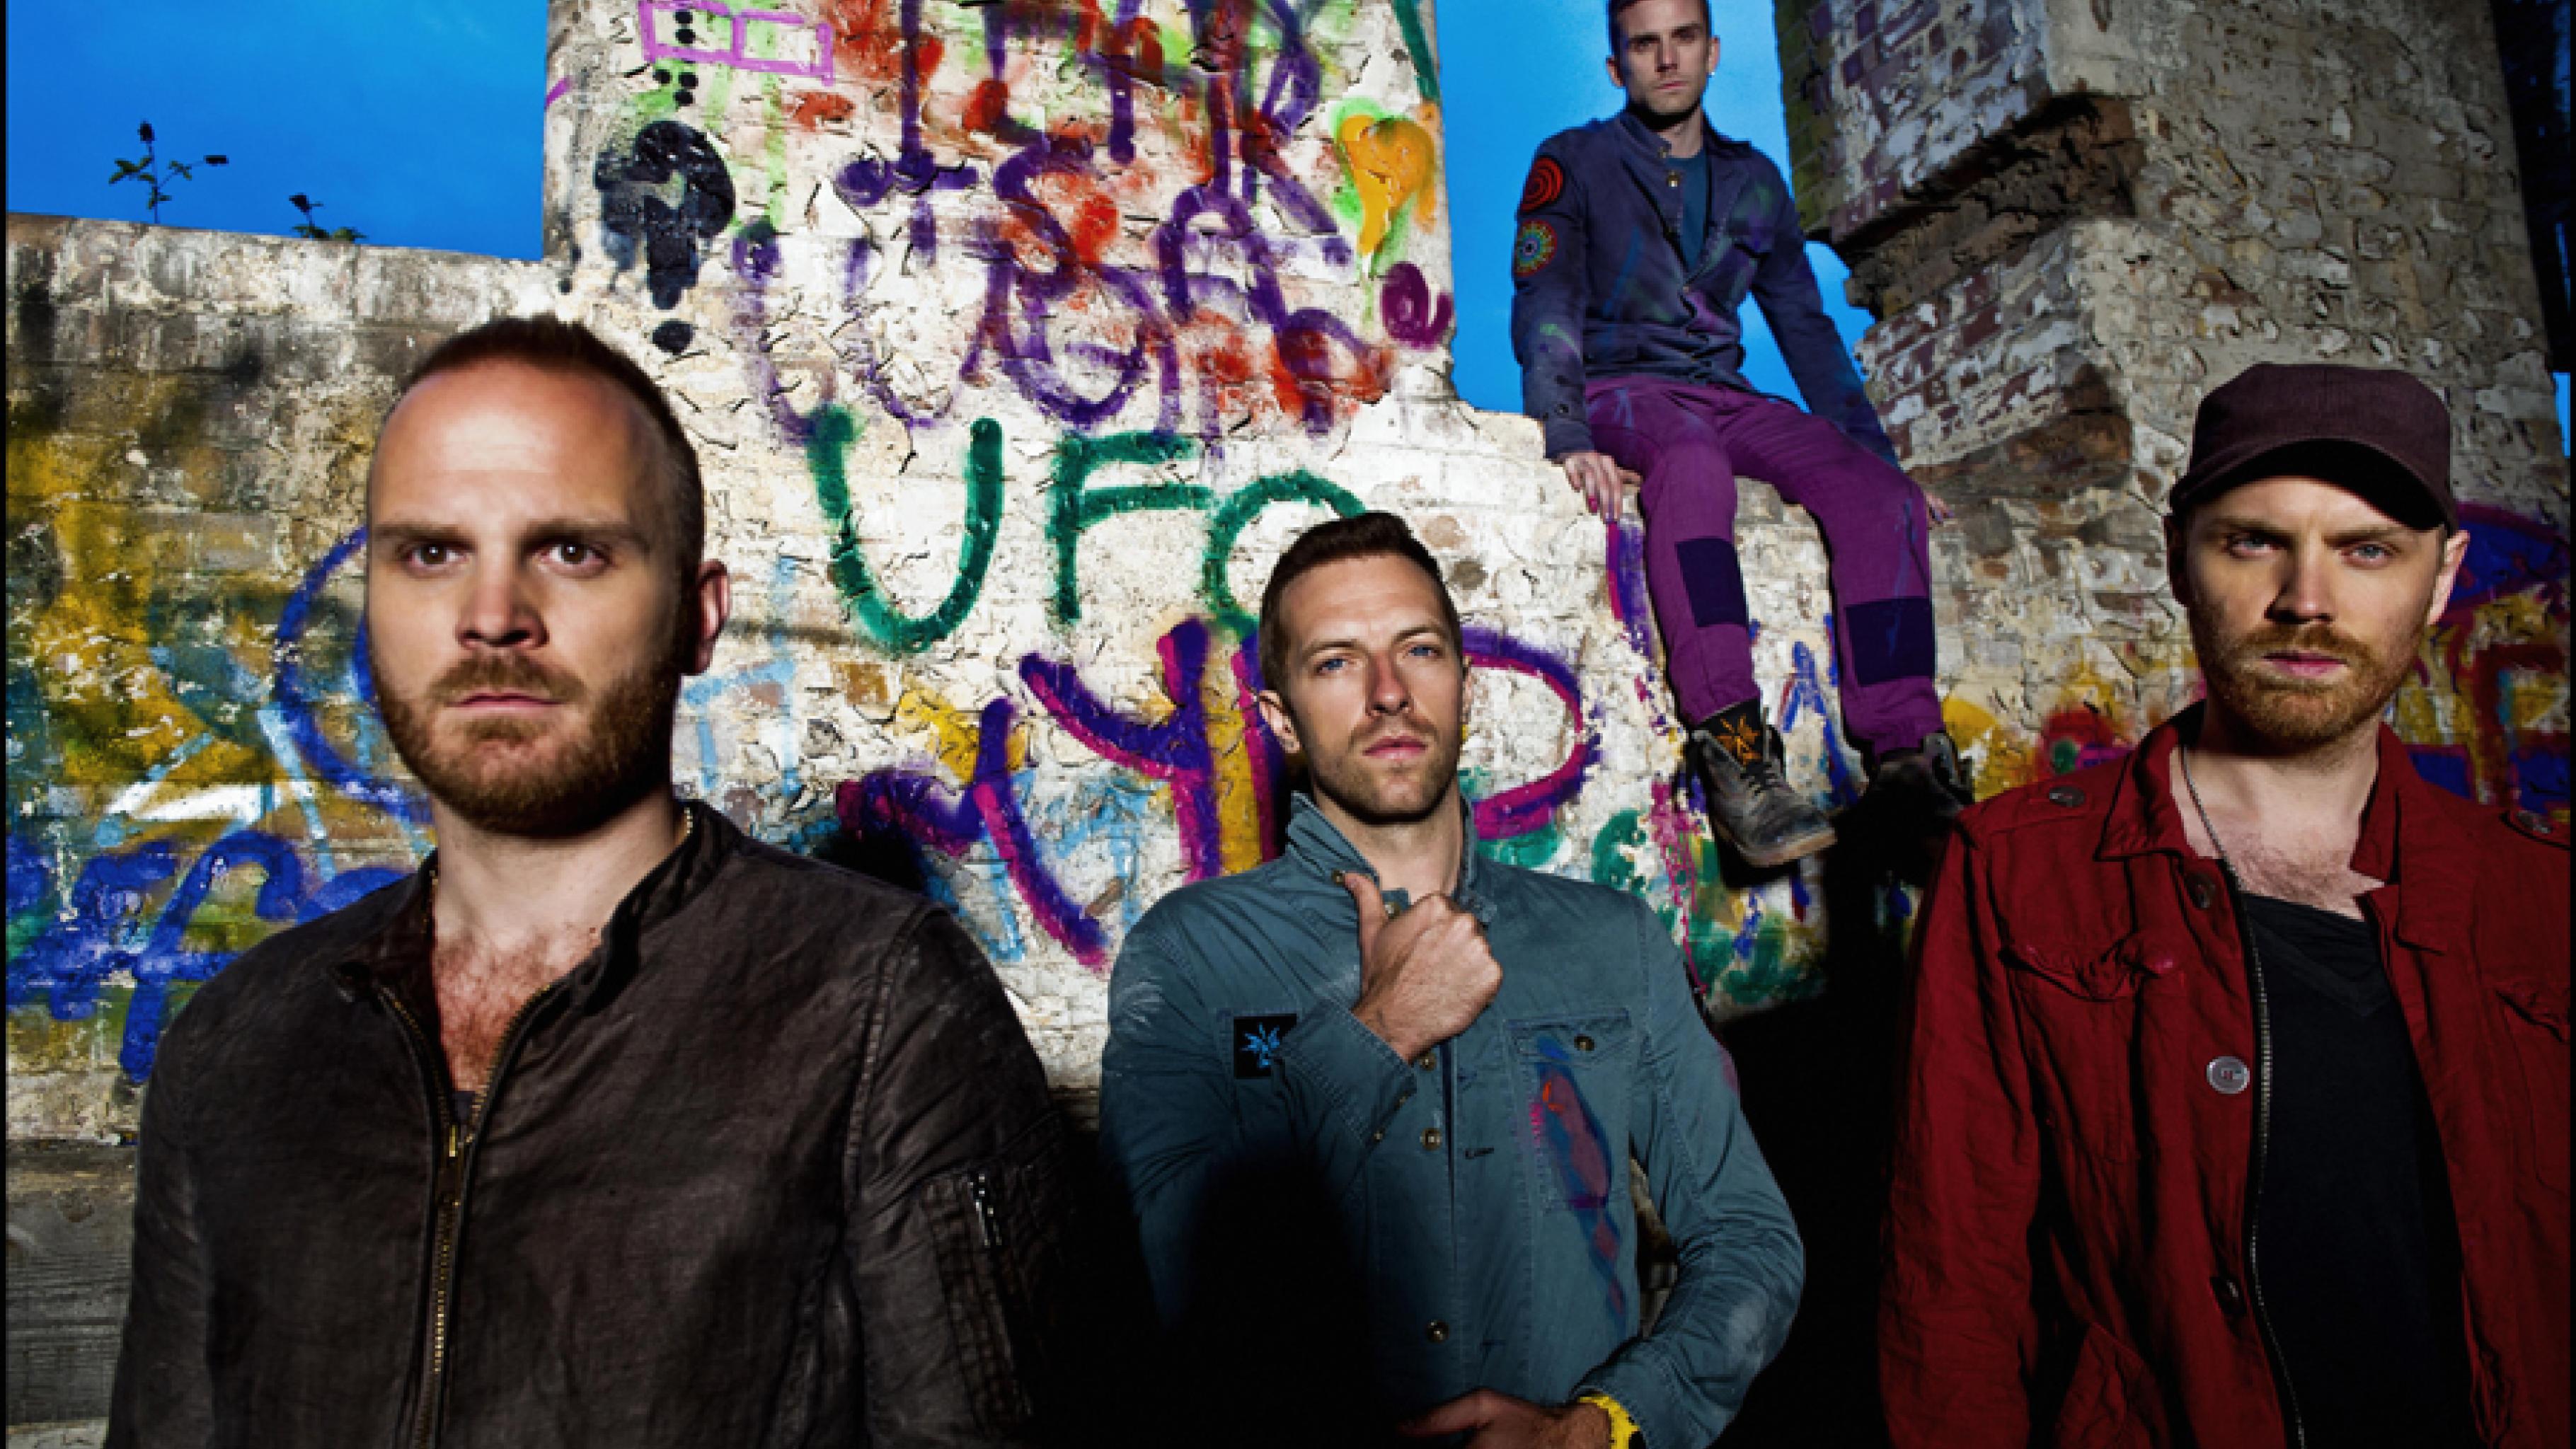 Oxfam on Tour Coldplay 2017 Registrierung